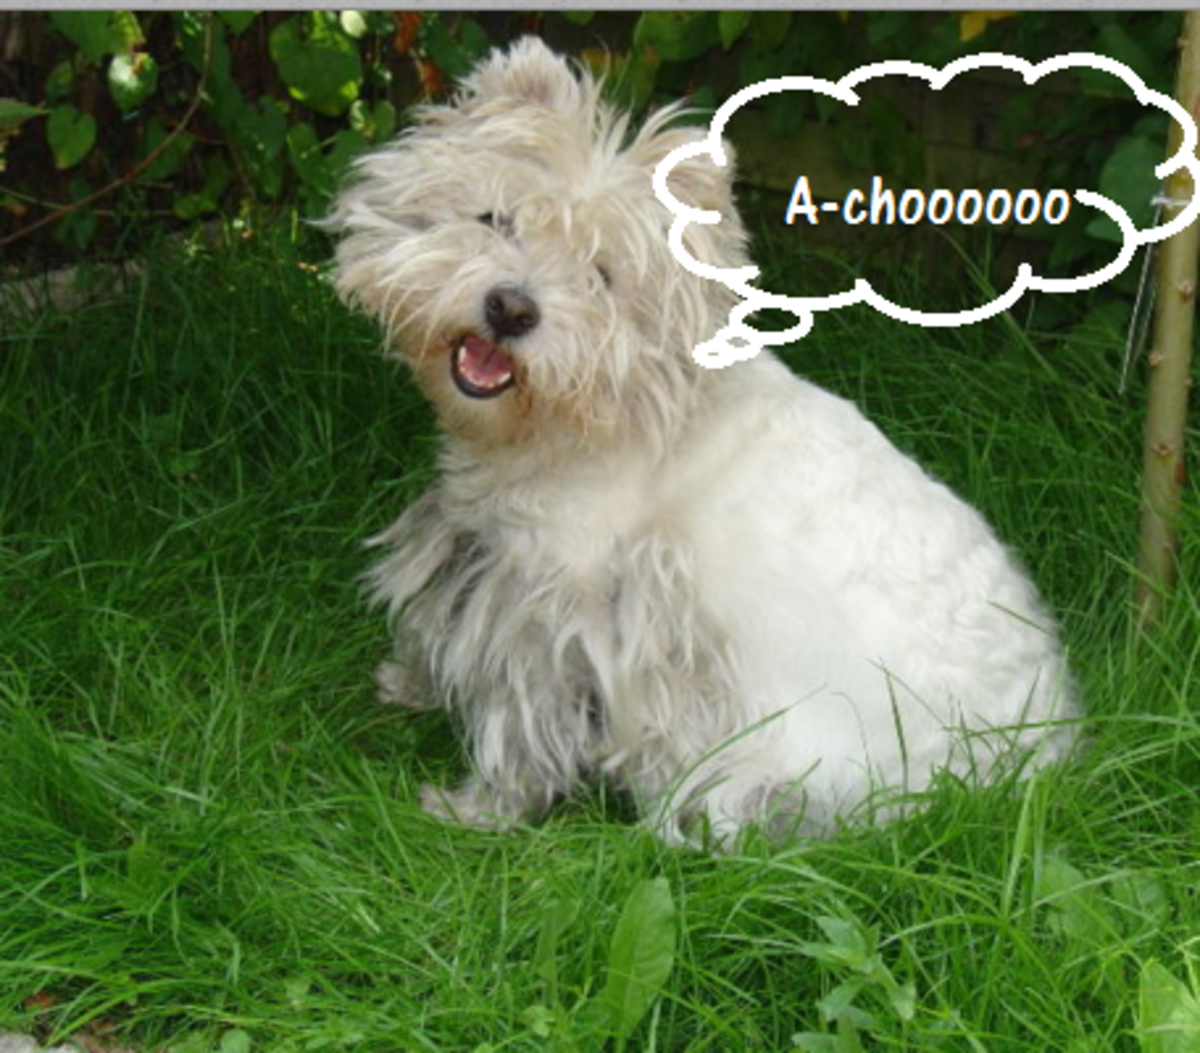 dog sneezing foxtail